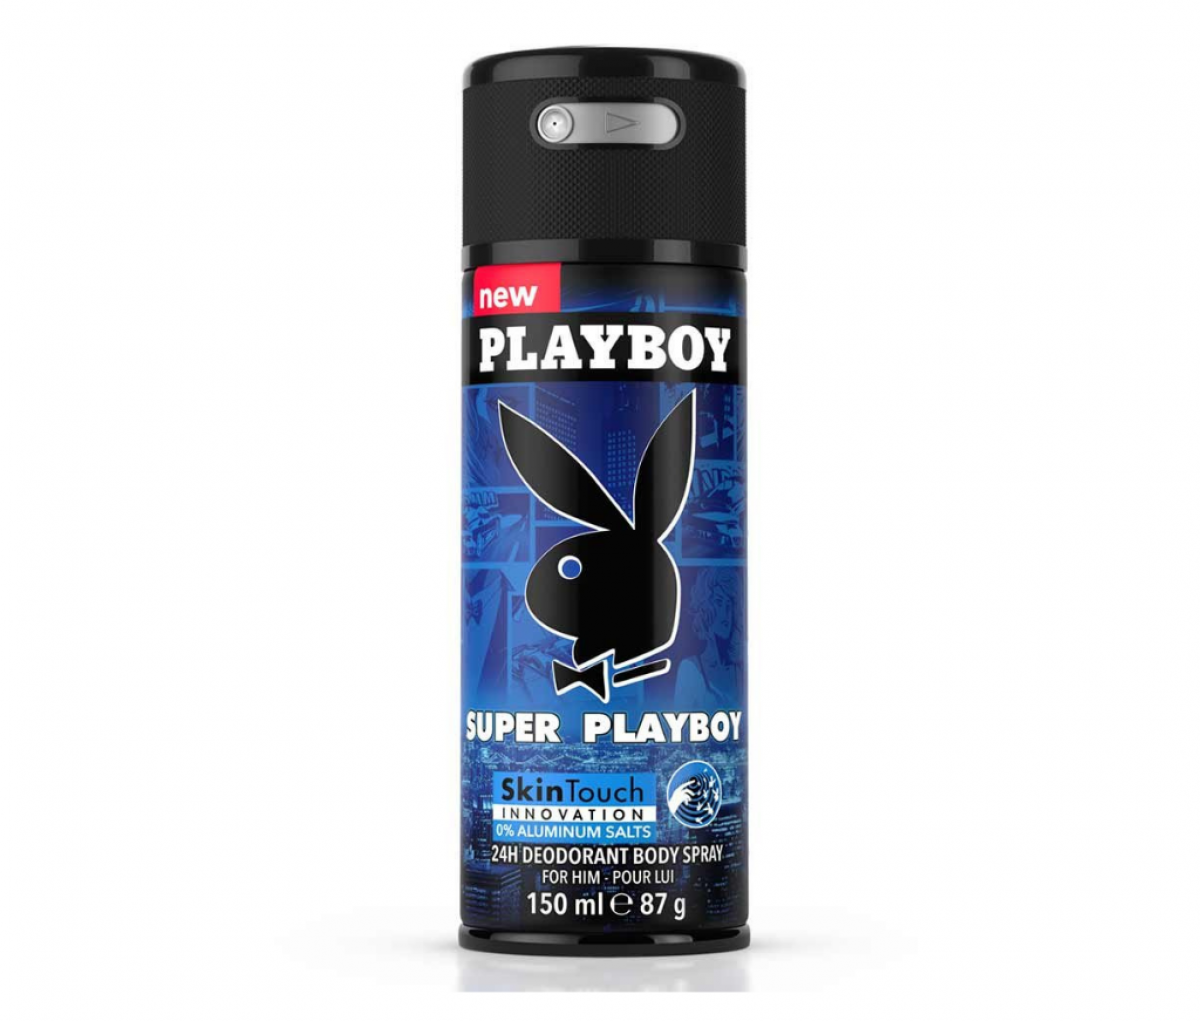 Playboy Deo 150ml Super Playboy